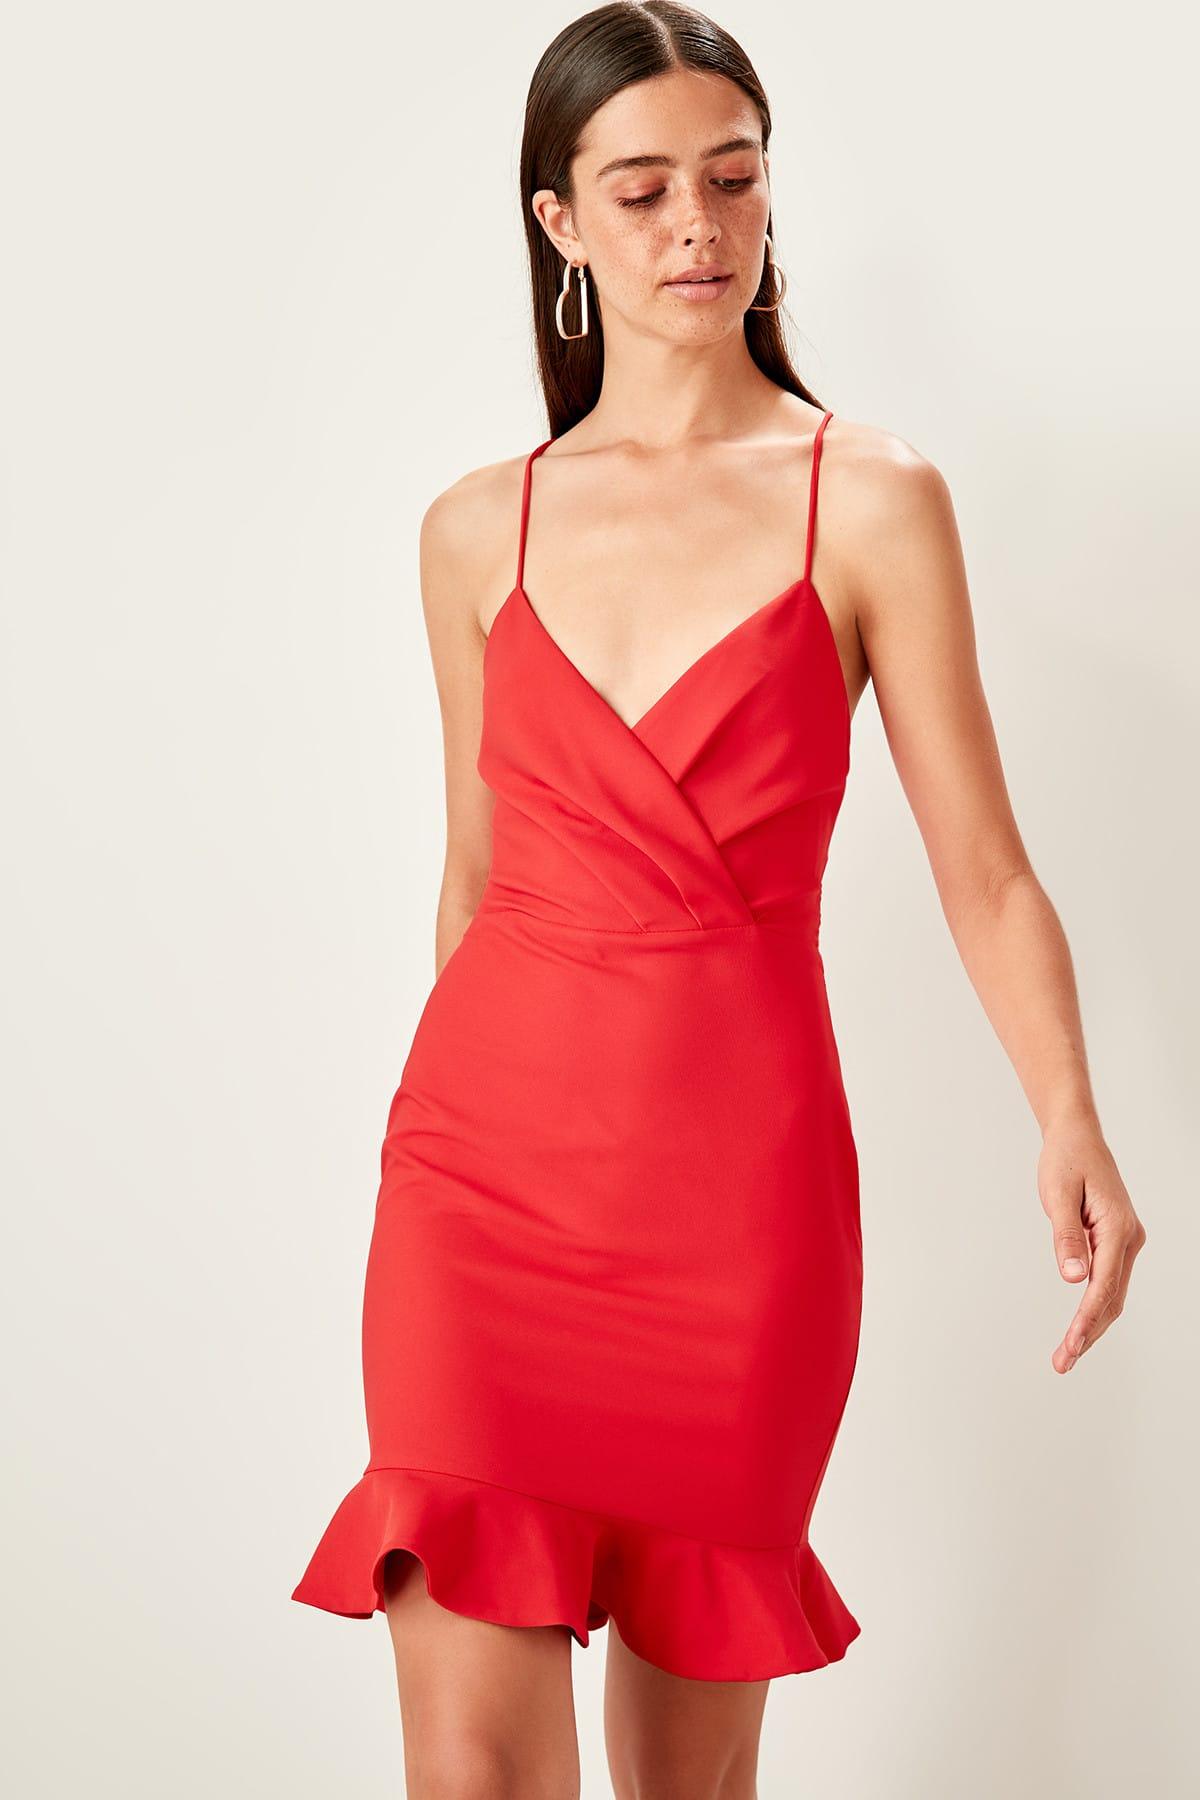 Trendyol Hanging-Dress